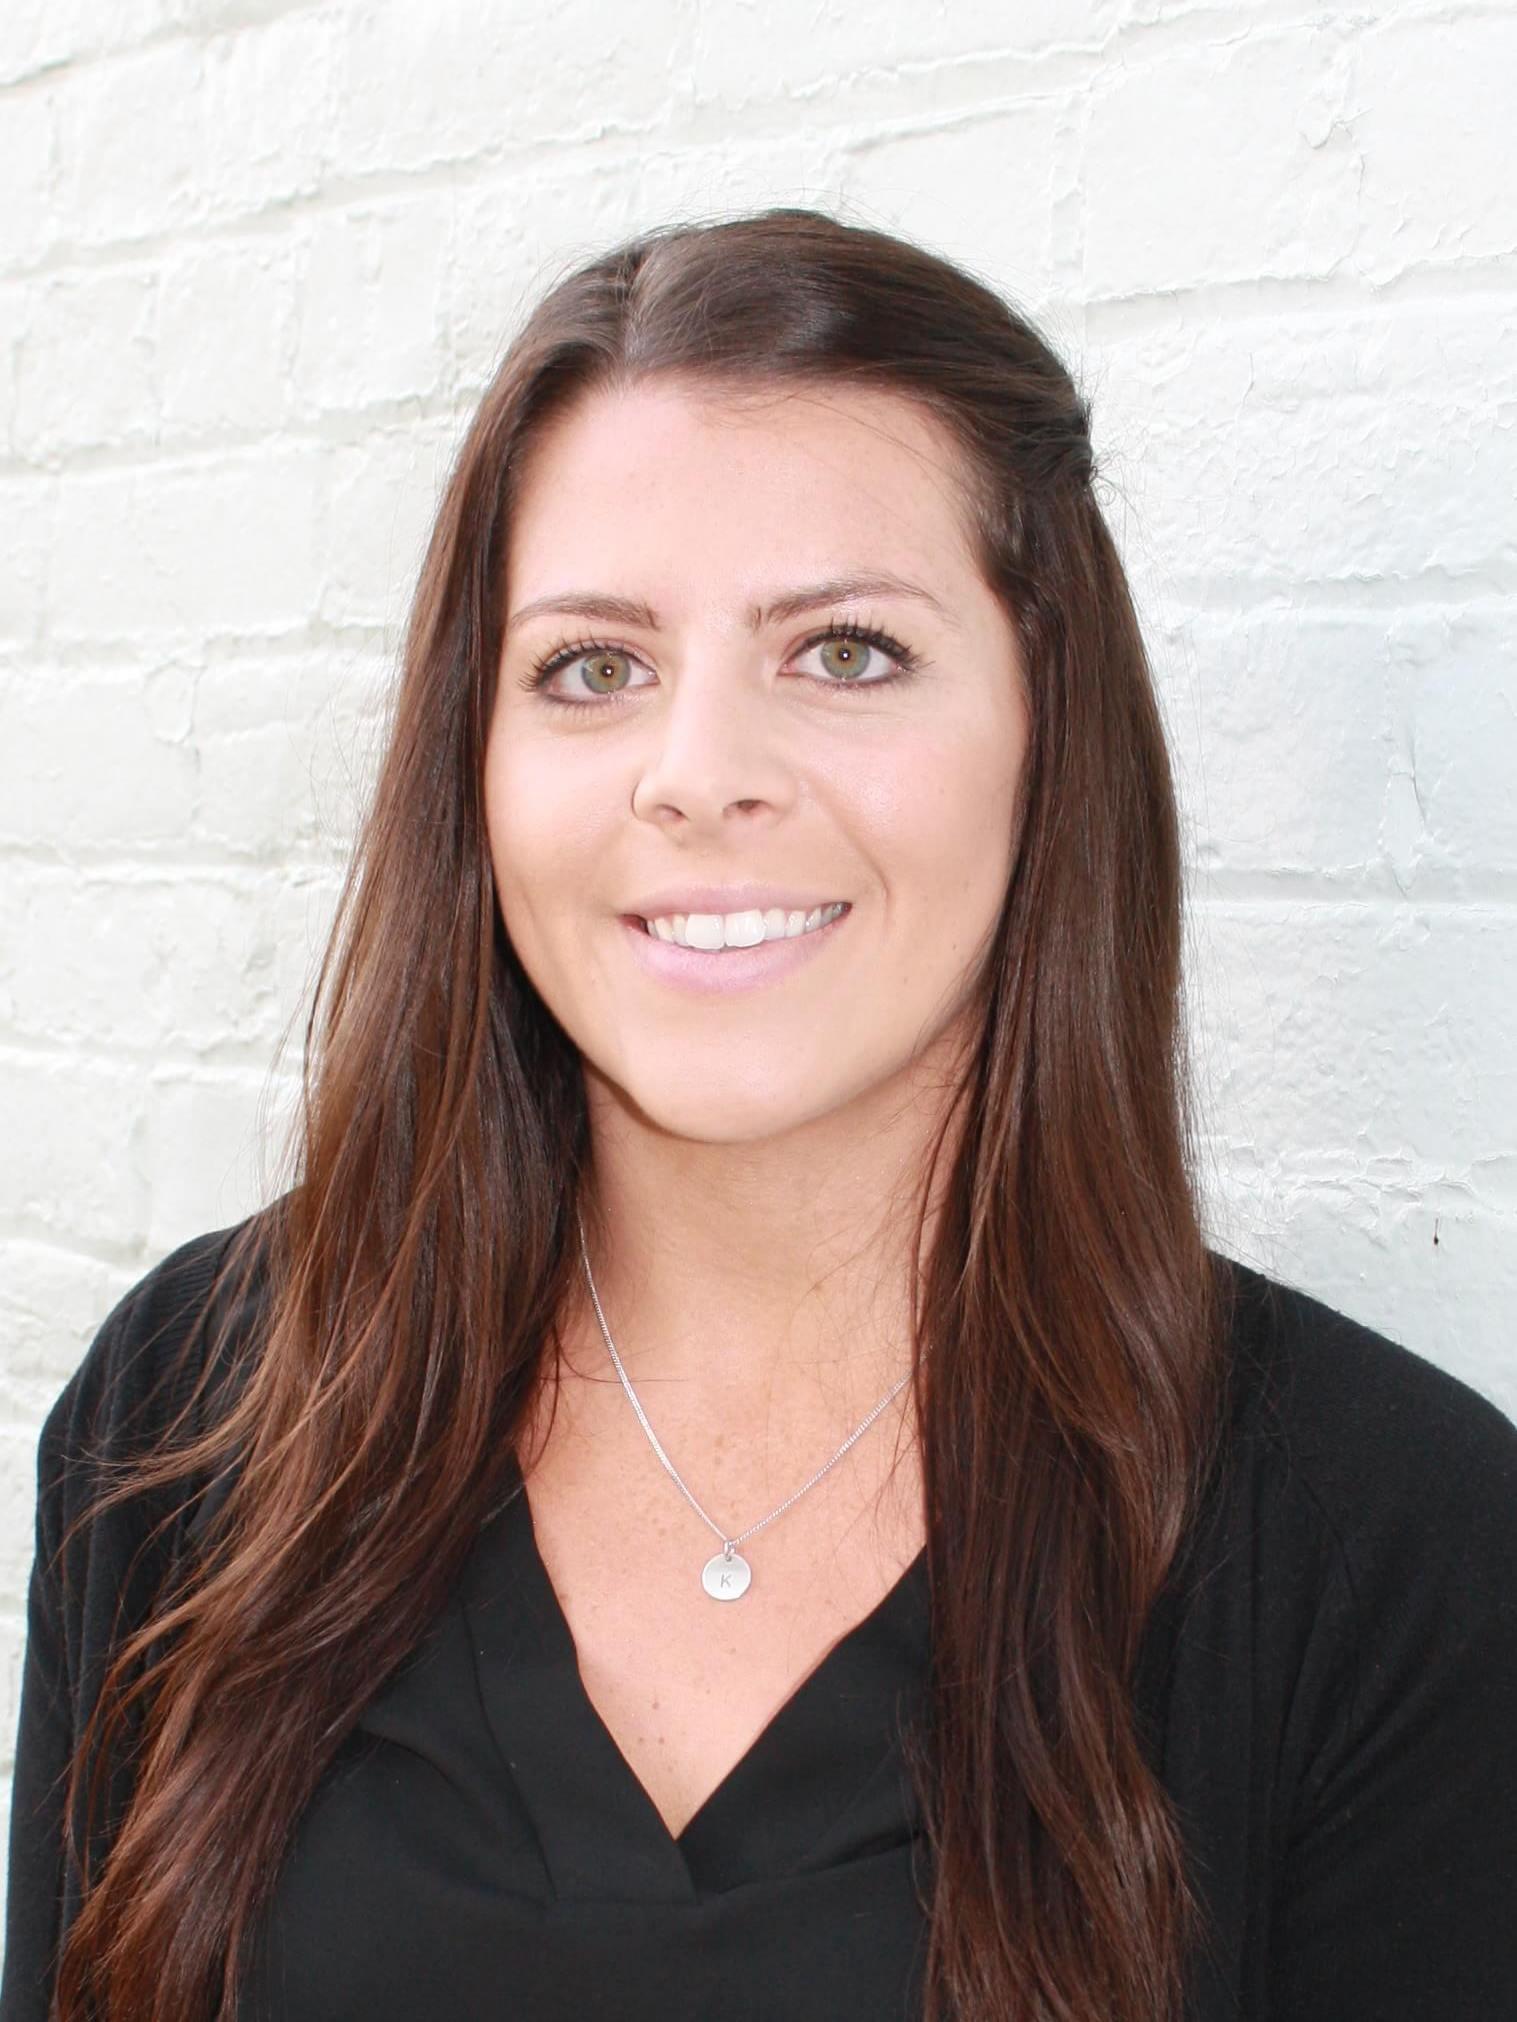 photo of Kristen Larocque, Board Director